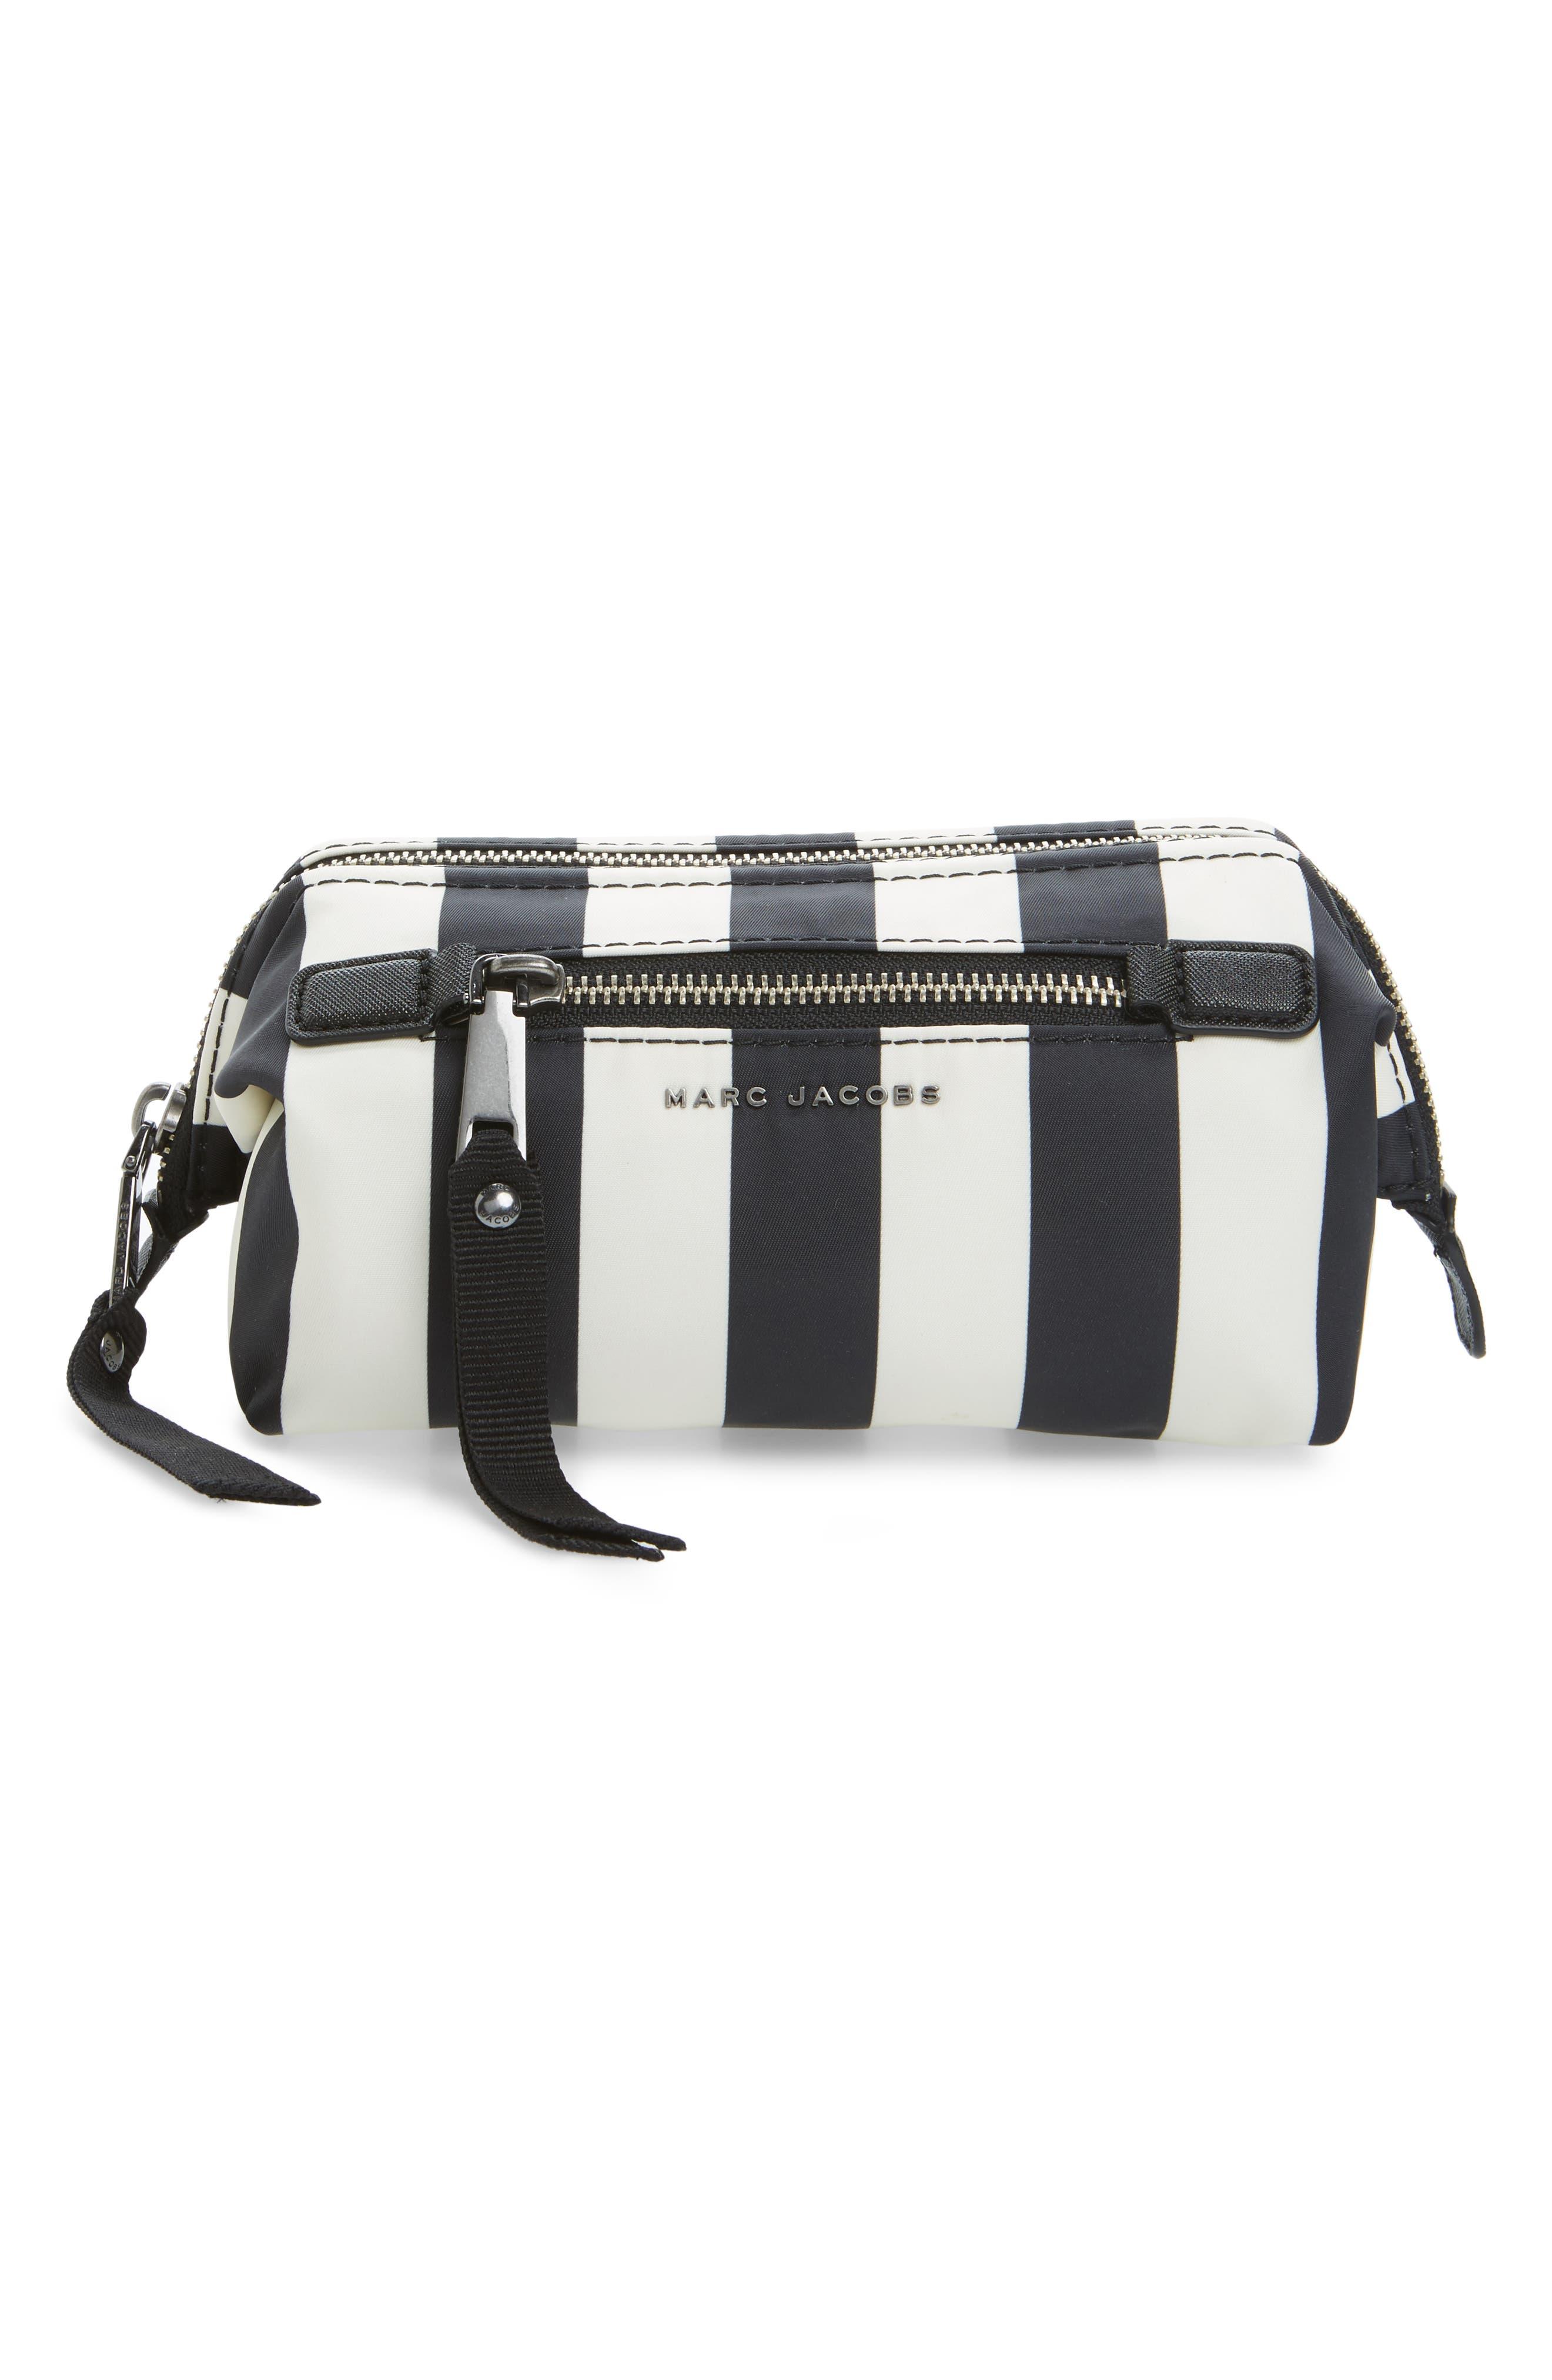 Stripes Trooper Cosmetics Bag,                         Main,                         color, Black Multi